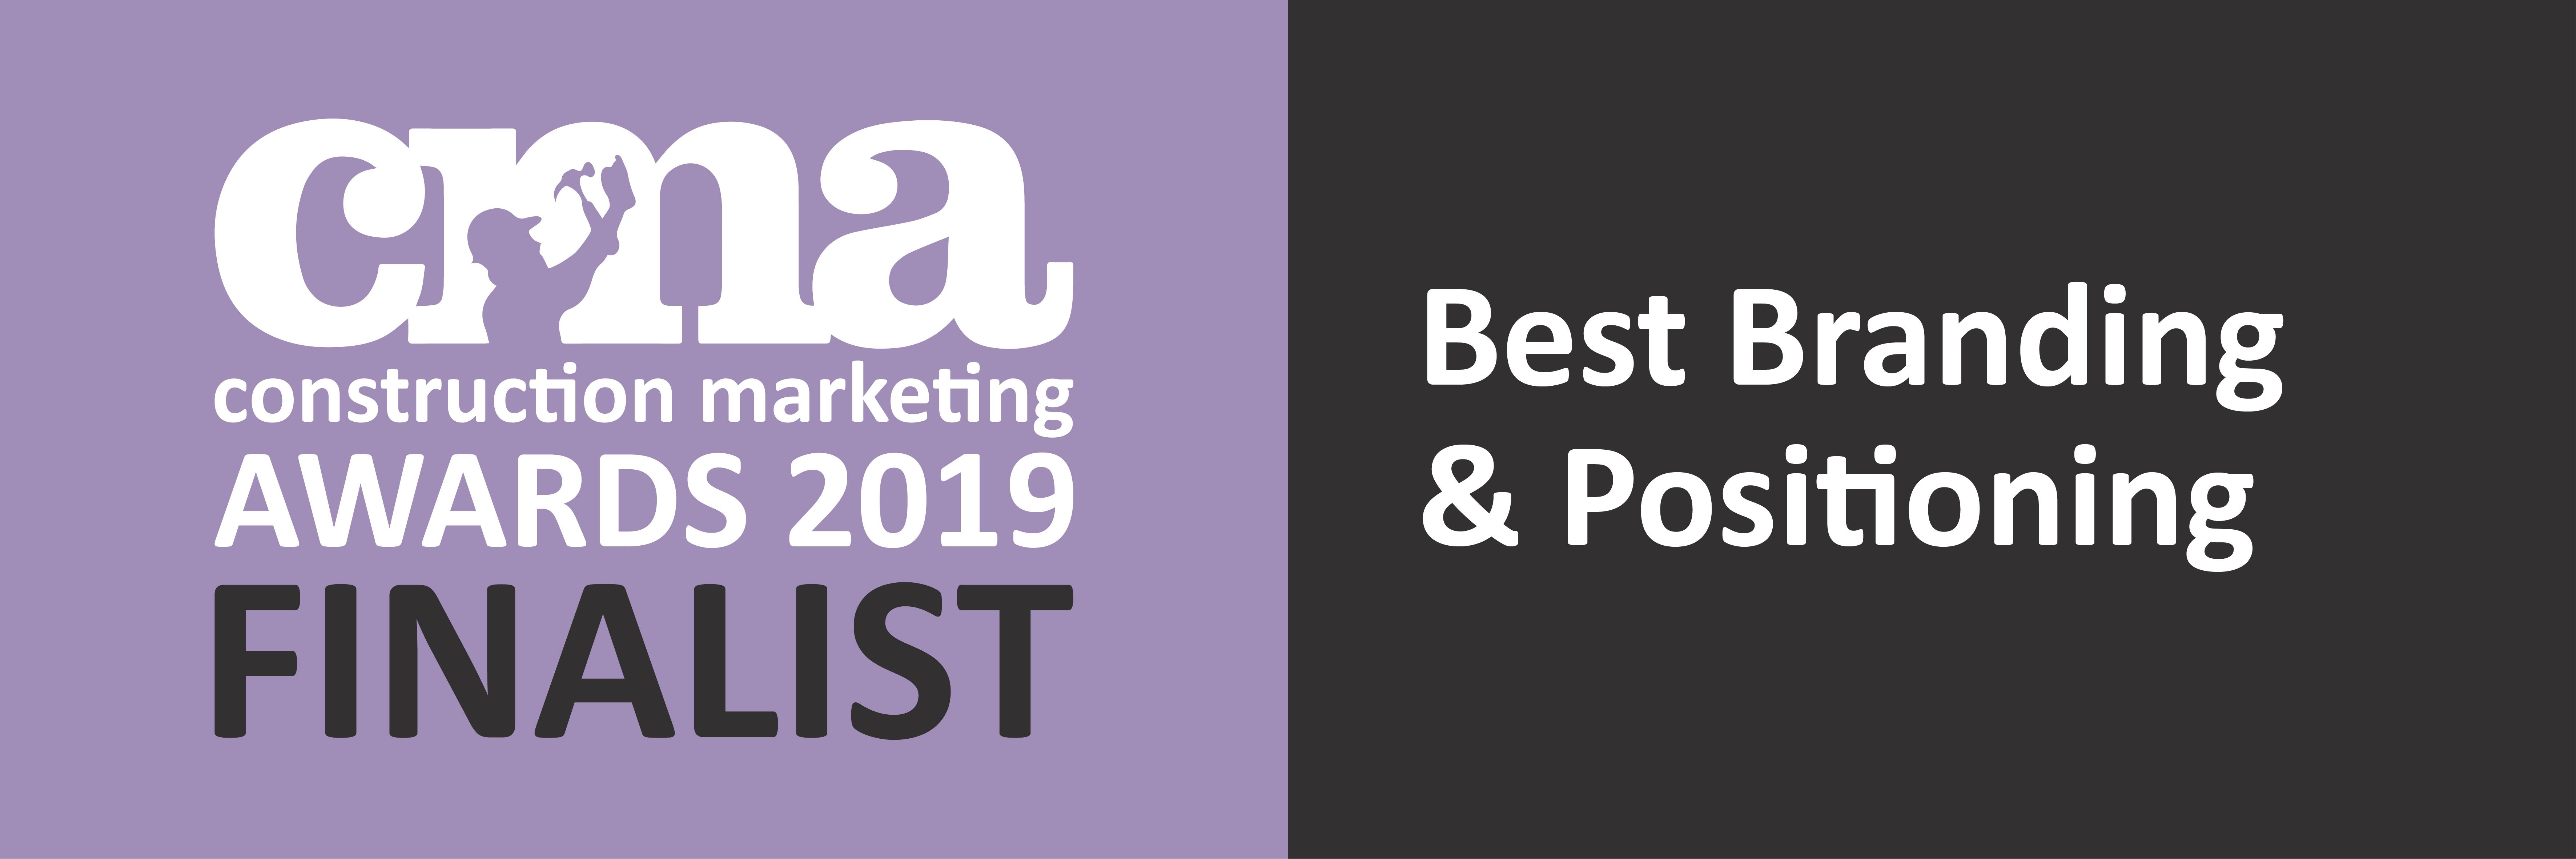 10. CMA-2019-Finalist-Best-Branding-&-Positioning-OL